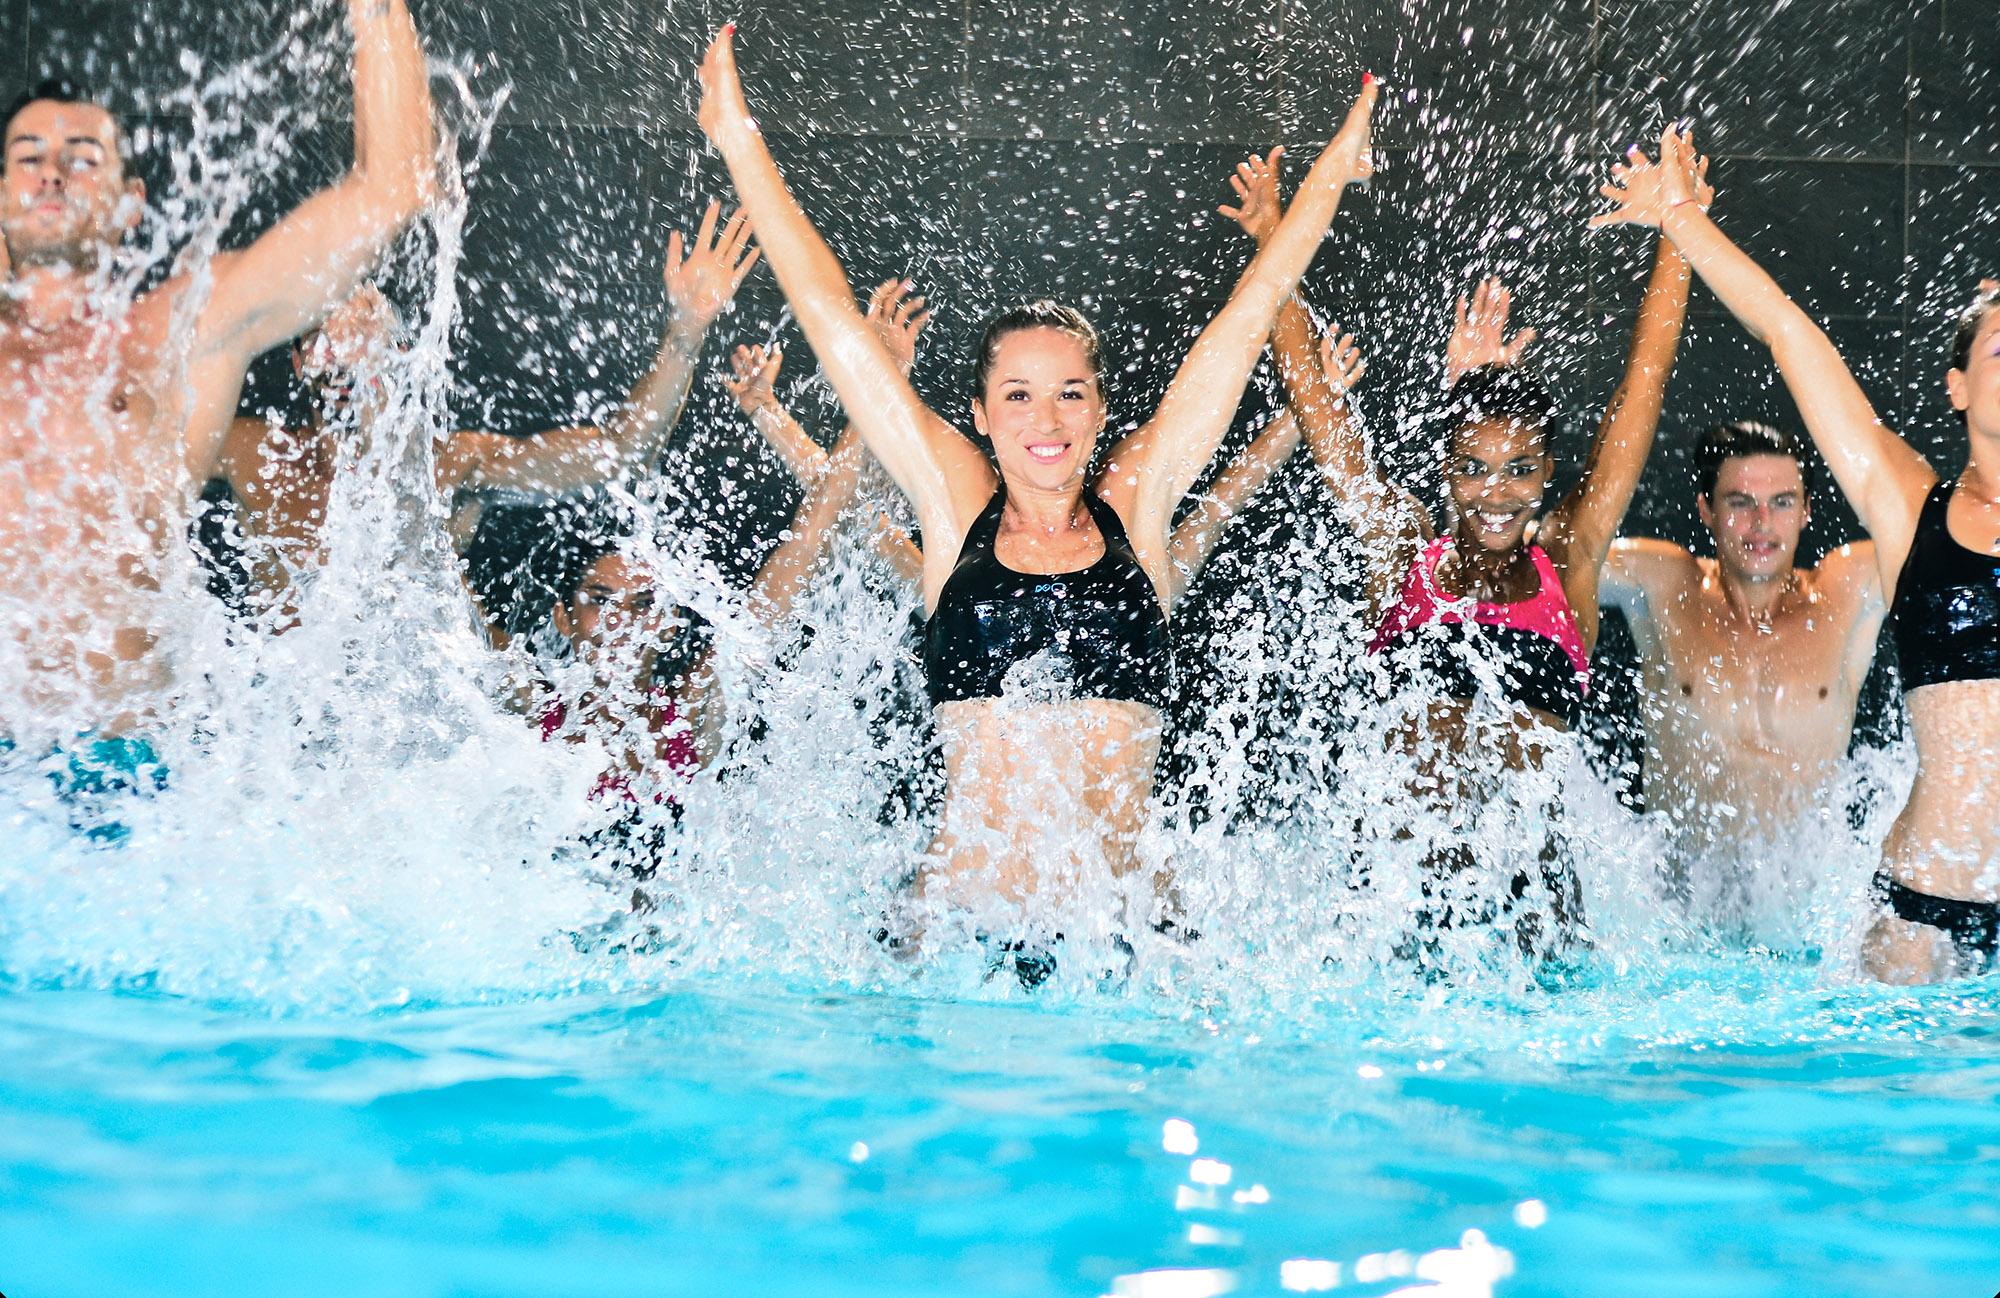 Photo cours aquatraining Dans la salle Olympe Aqua Fitness